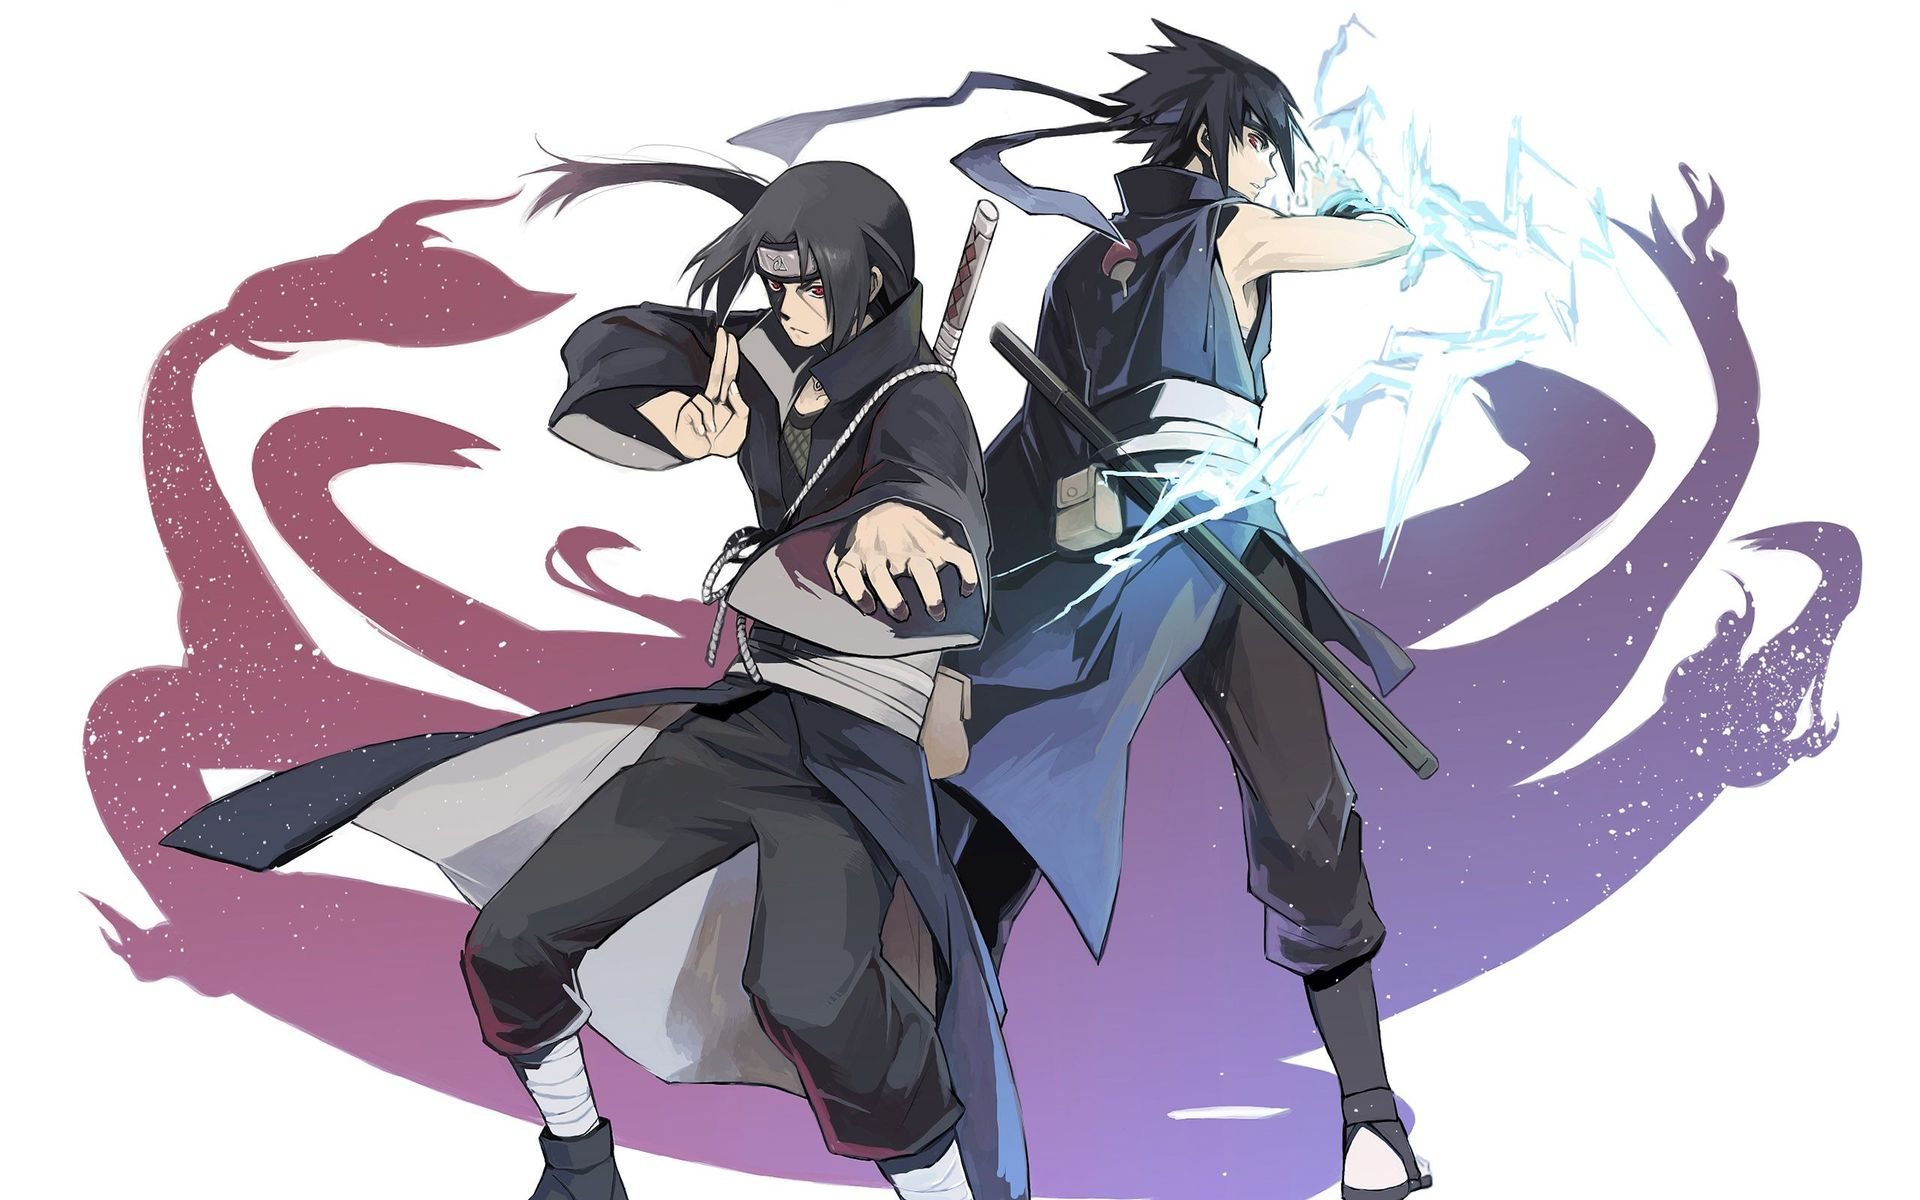 45 Sasuke And Itachi Wallpaper Hd On Wallpapersafari